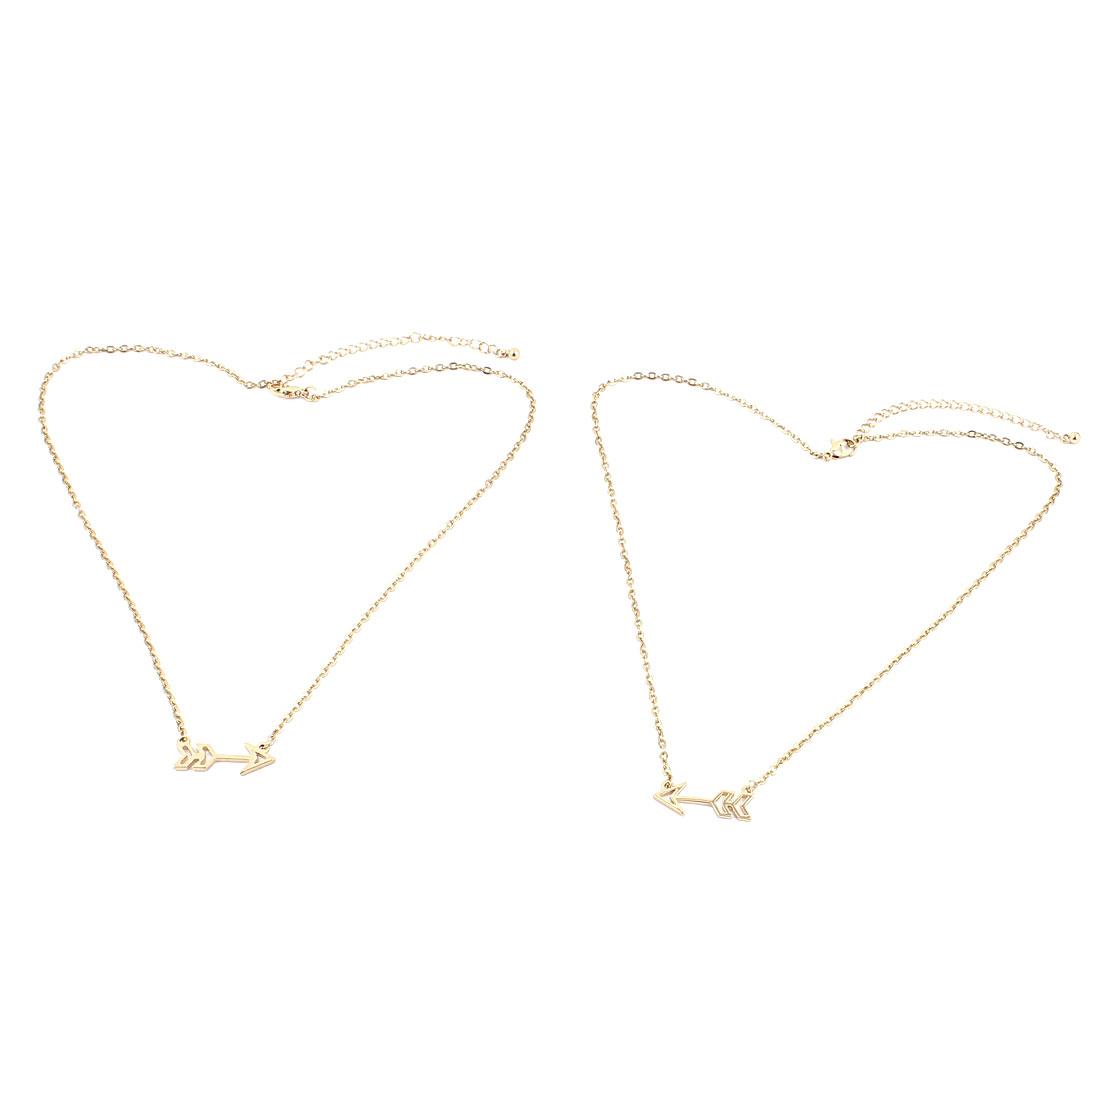 2 Pcs Gold Tone Metal Single Arrow Detail Lobster Buckle Strip Link Slim Chain Necklace Neckwear Collar for Ladies Women